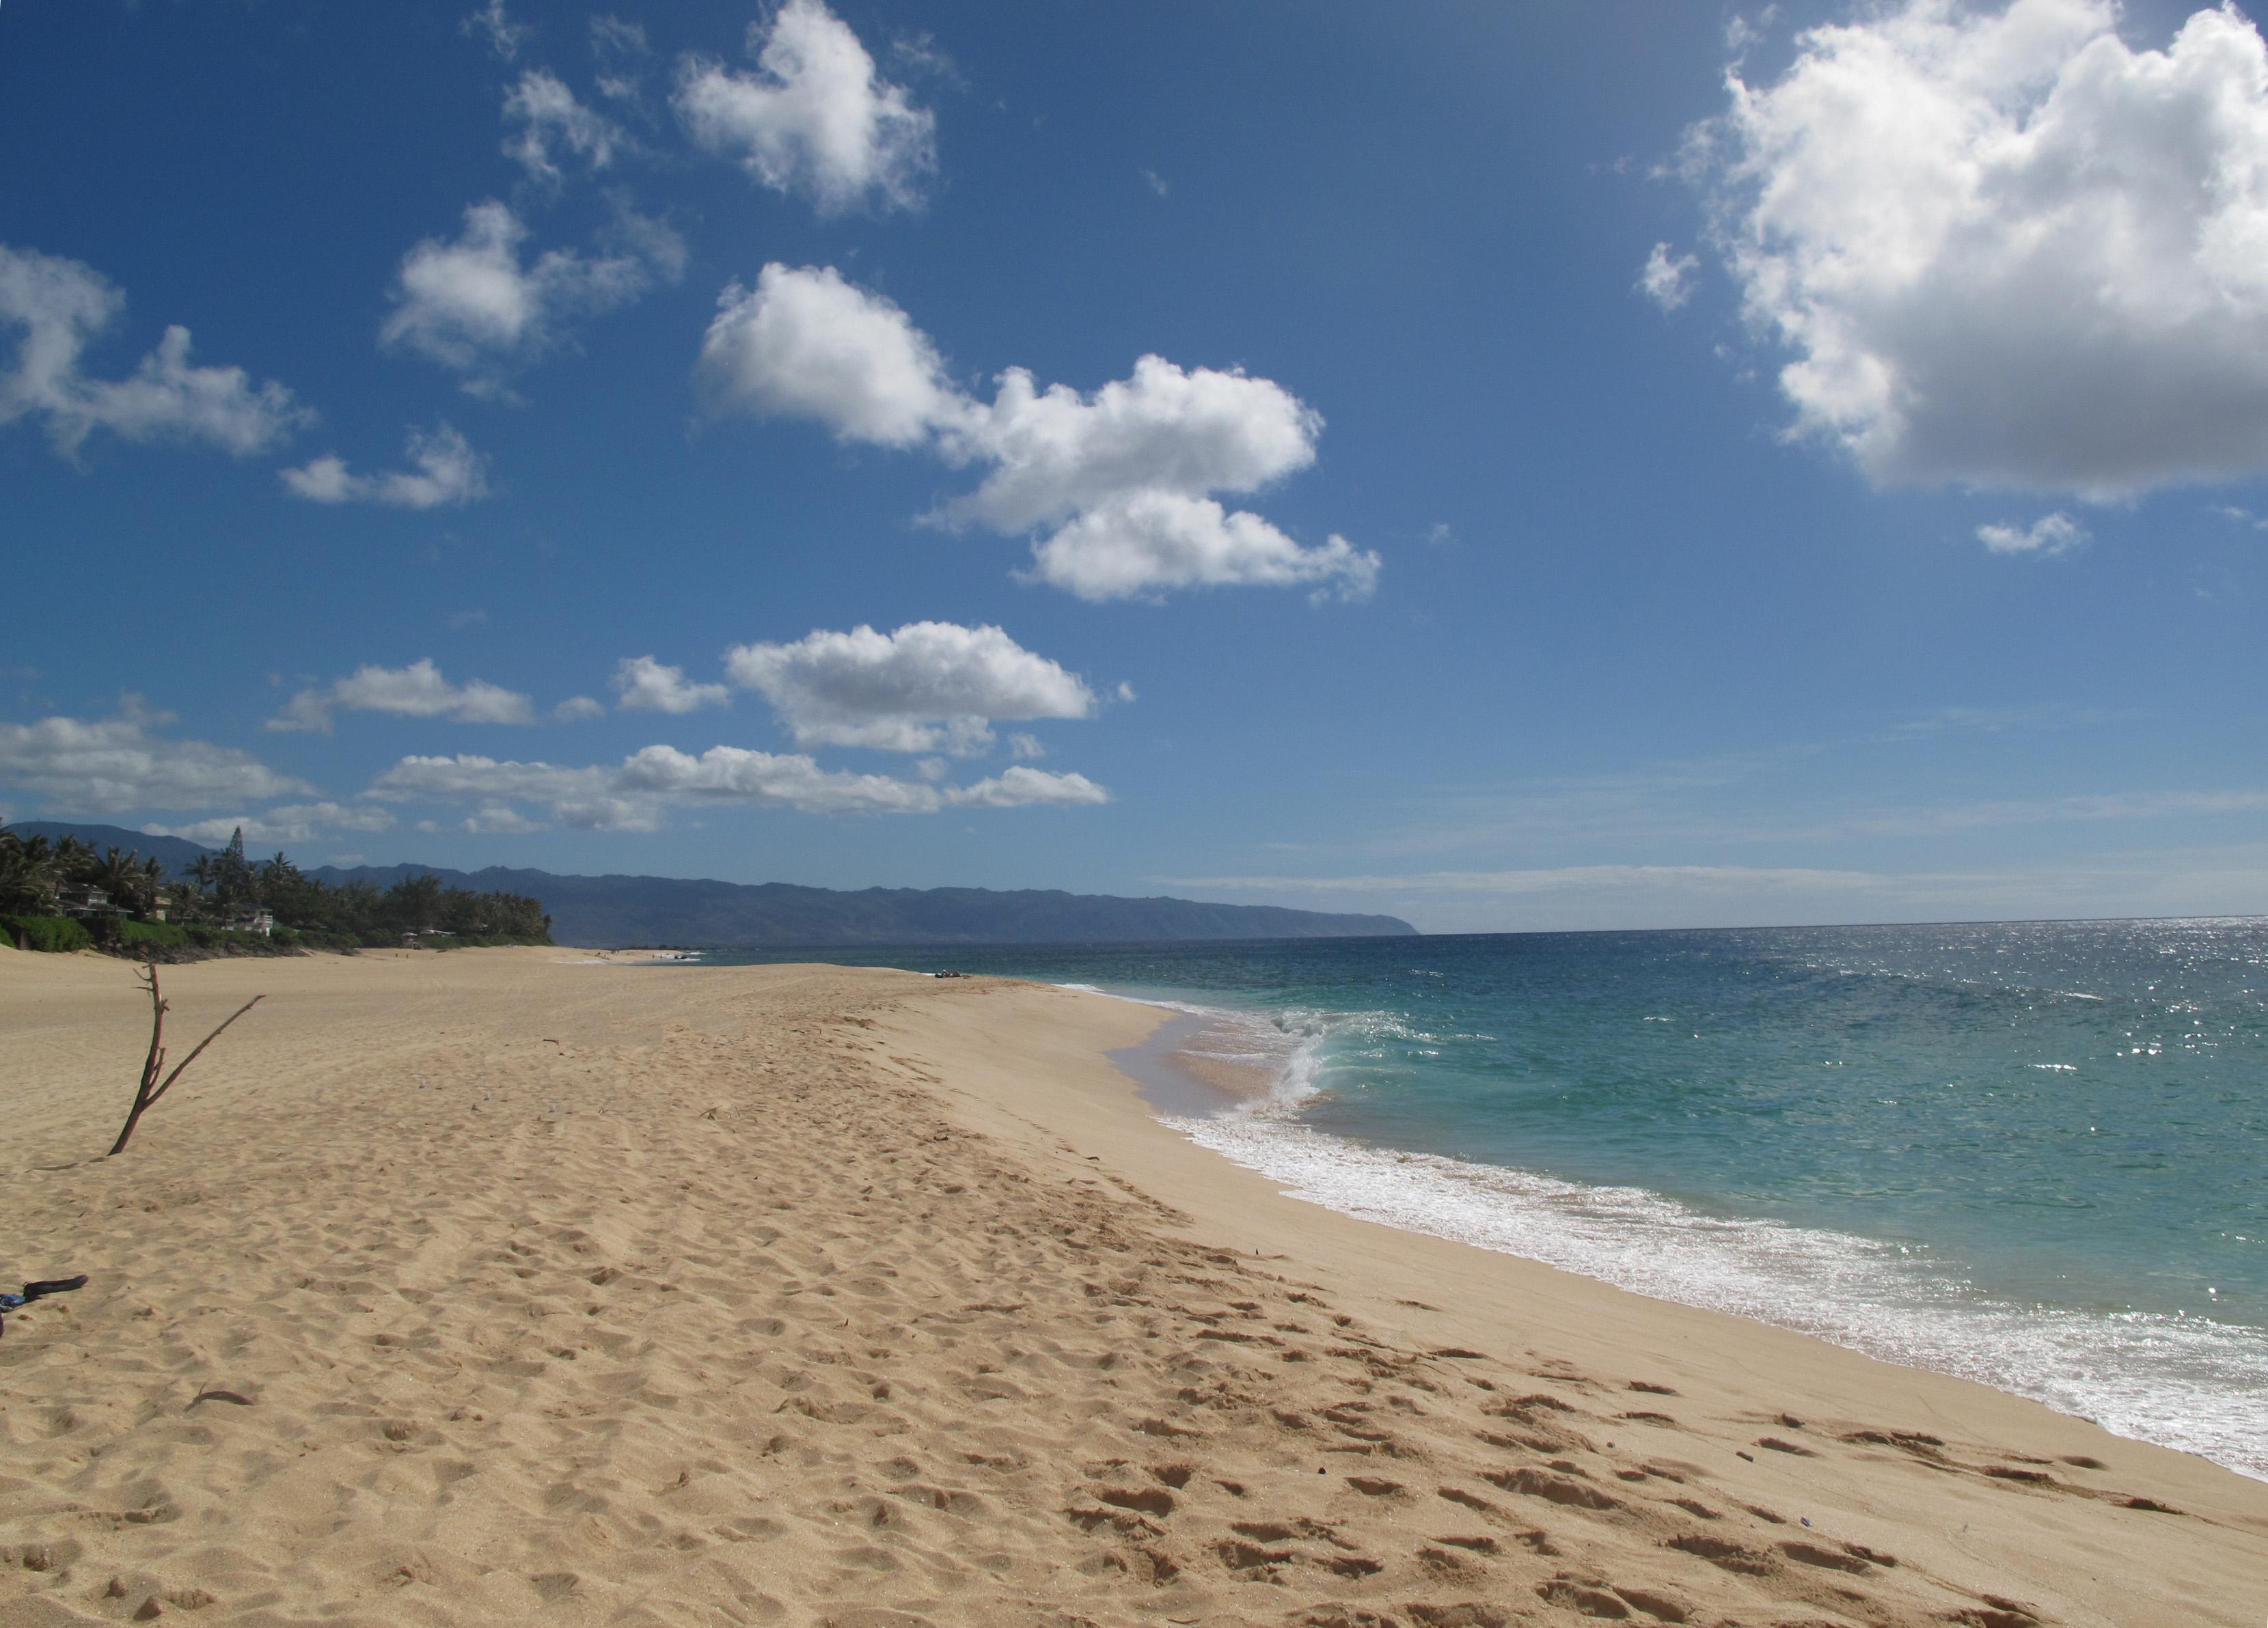 Empty Beach-Northern Oahu | Adifferentstep's Blog